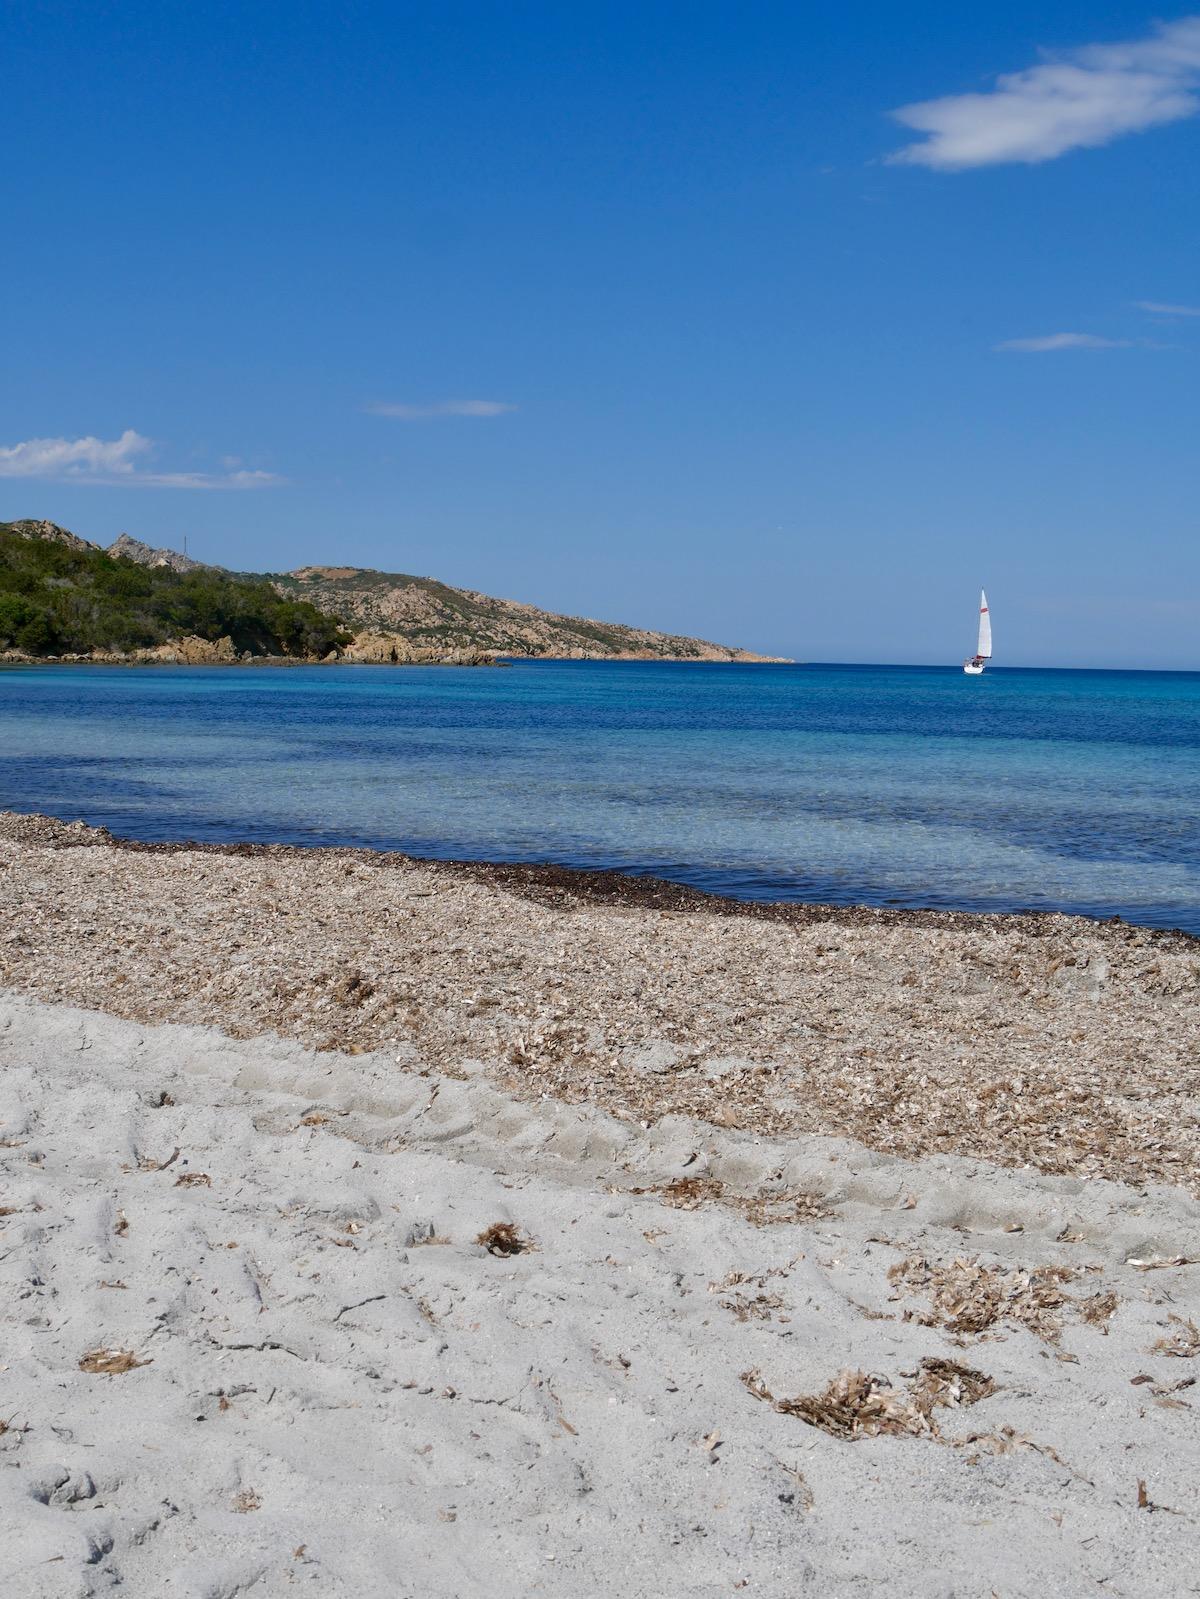 Plage de Caprera sur l'archipel de la Maddalena